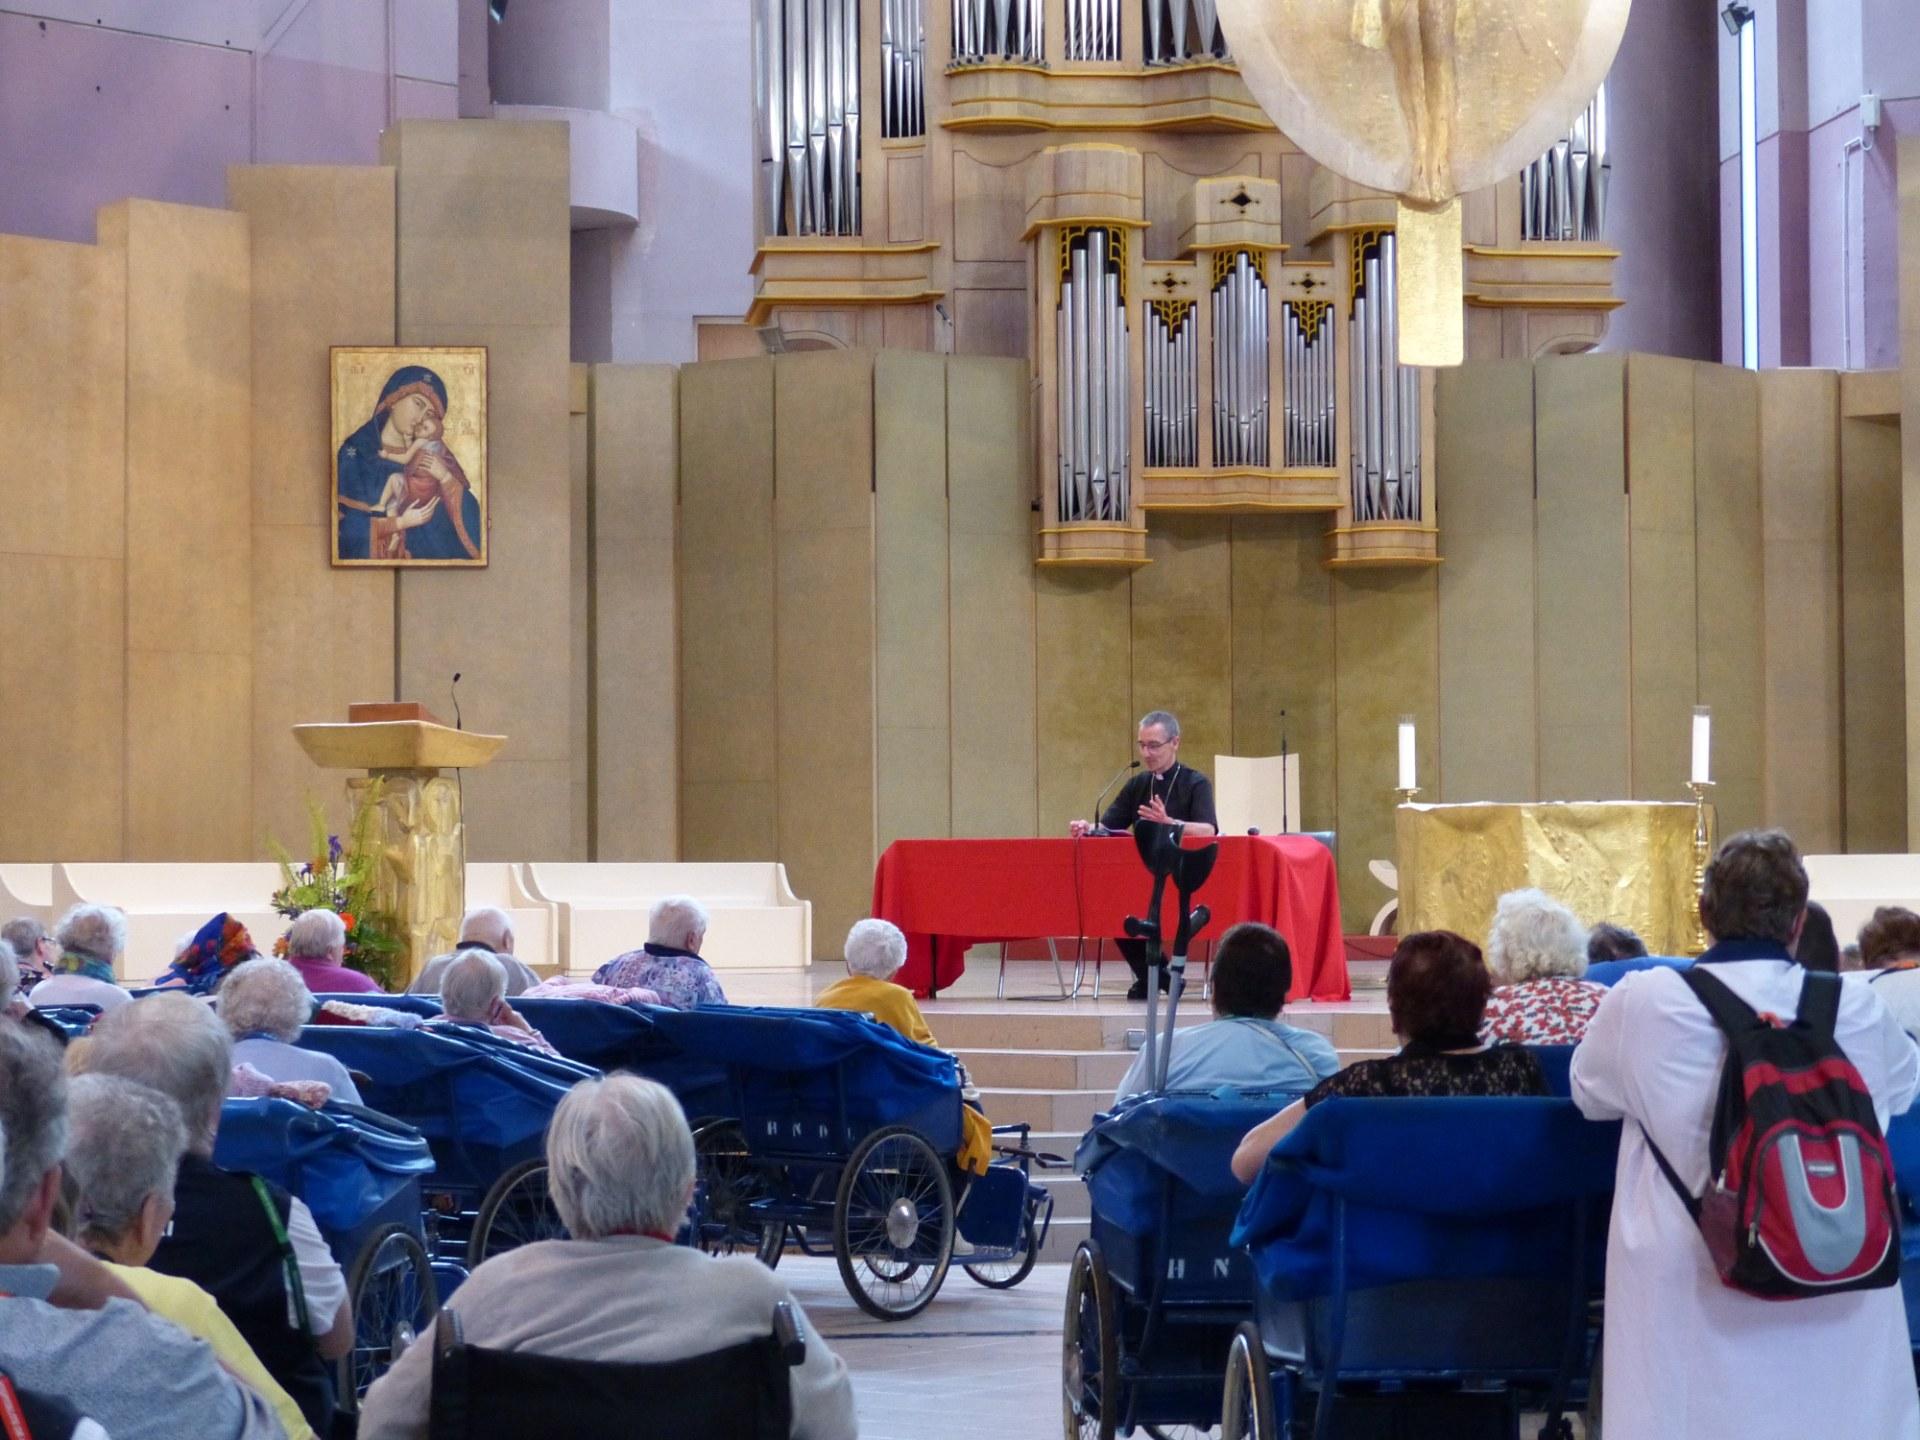 Lourdes2018-photos conference Mgr Dollmann (4)